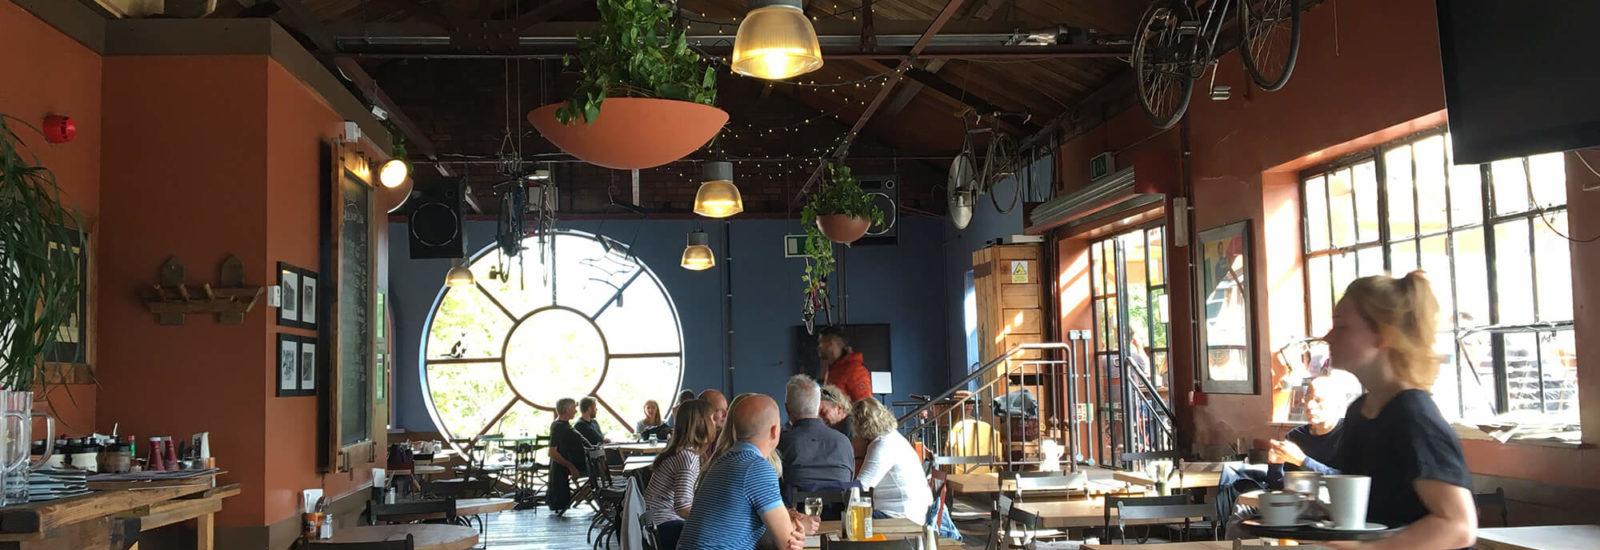 Image of Mud Dock Café